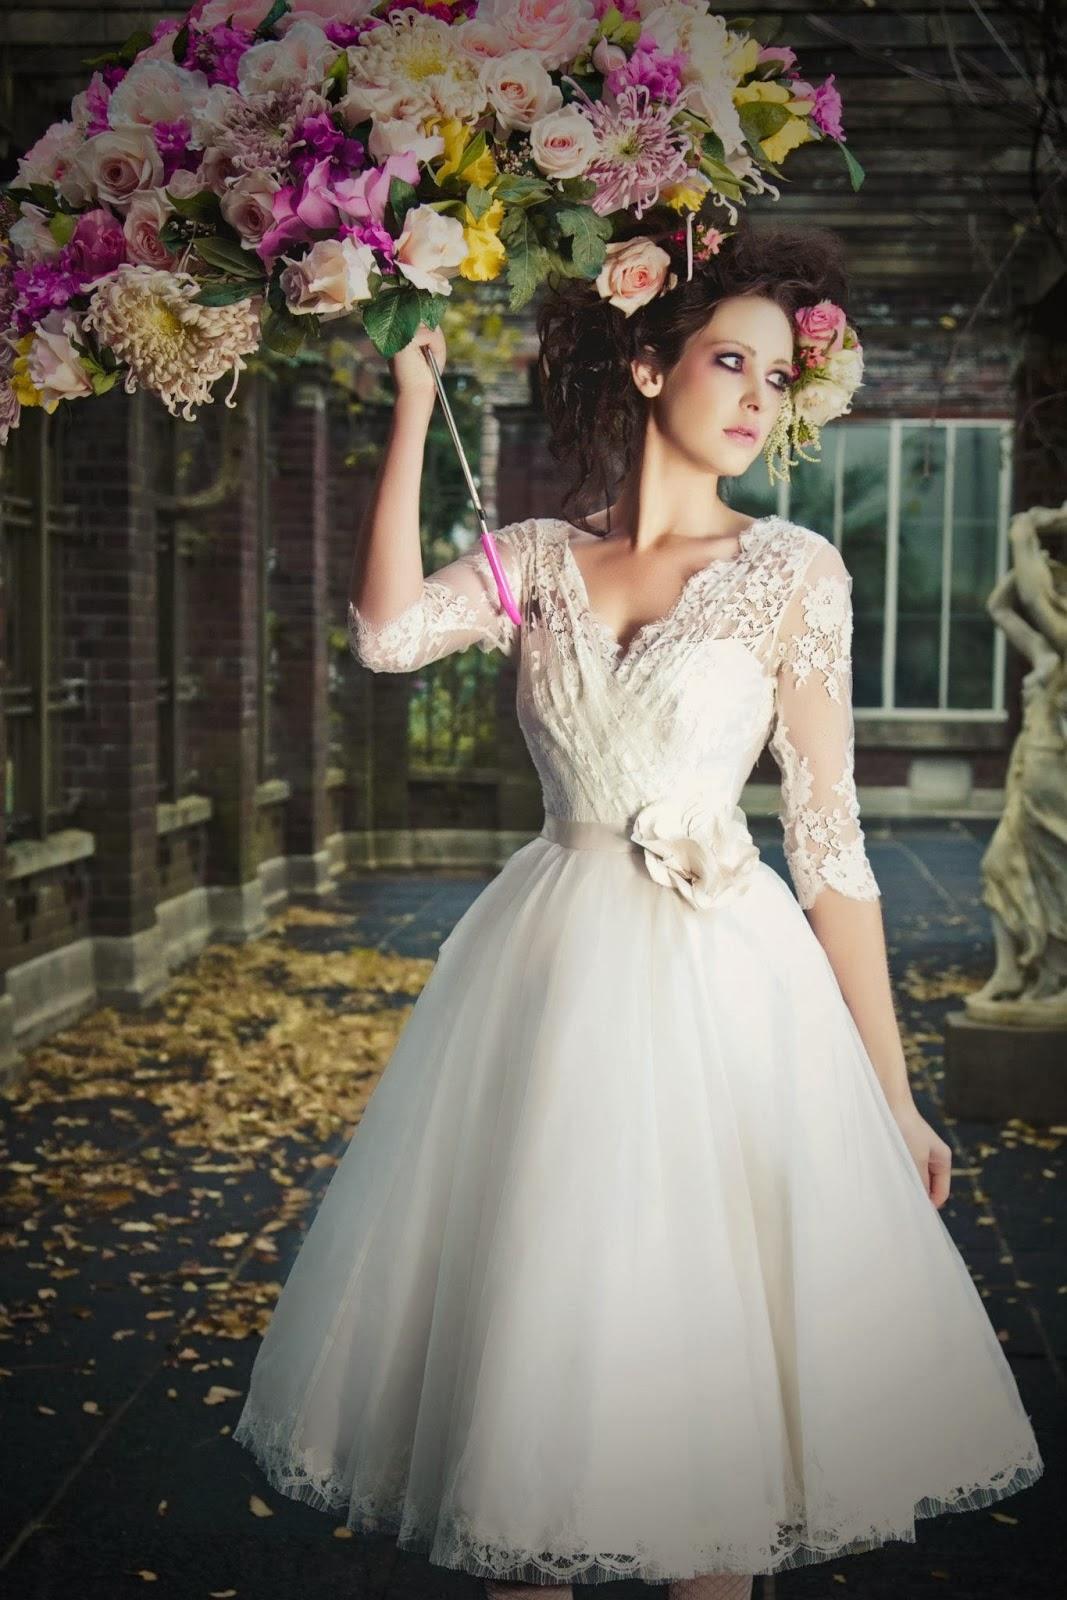 Idle Fancy: The Sewist Buys a Wedding Dress